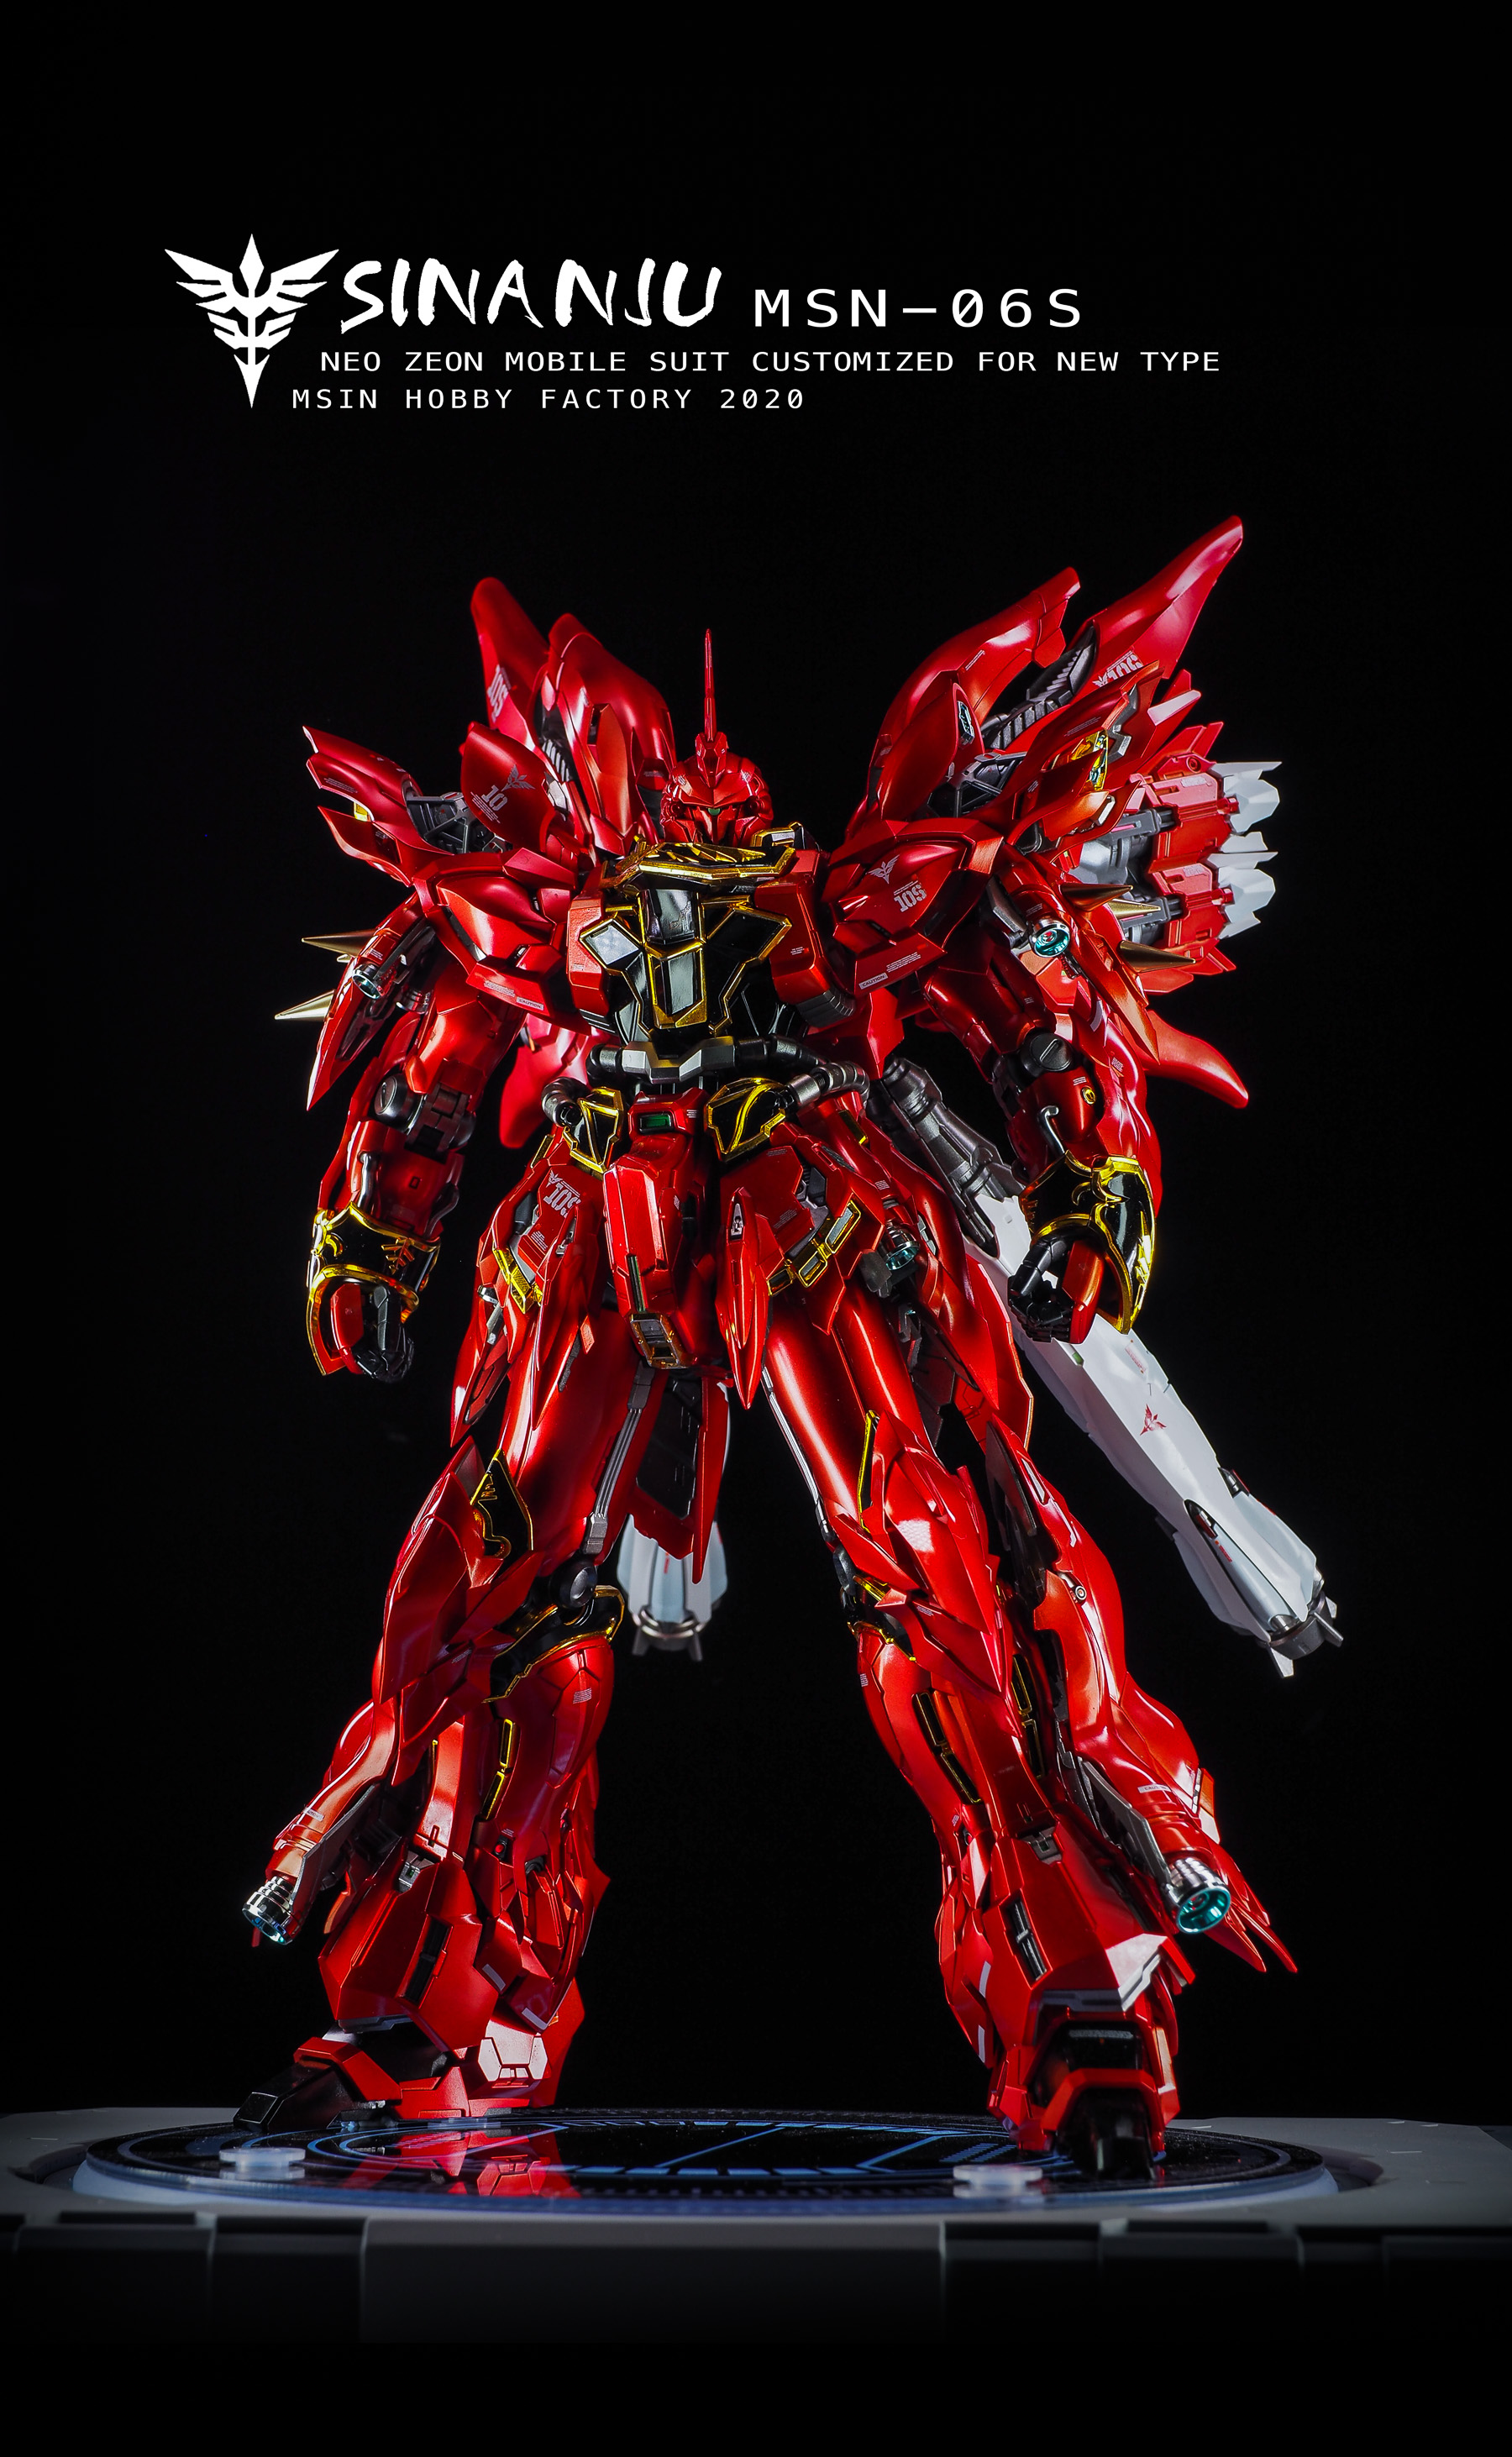 S437_6_takumi_sinanju_red_002.jpg